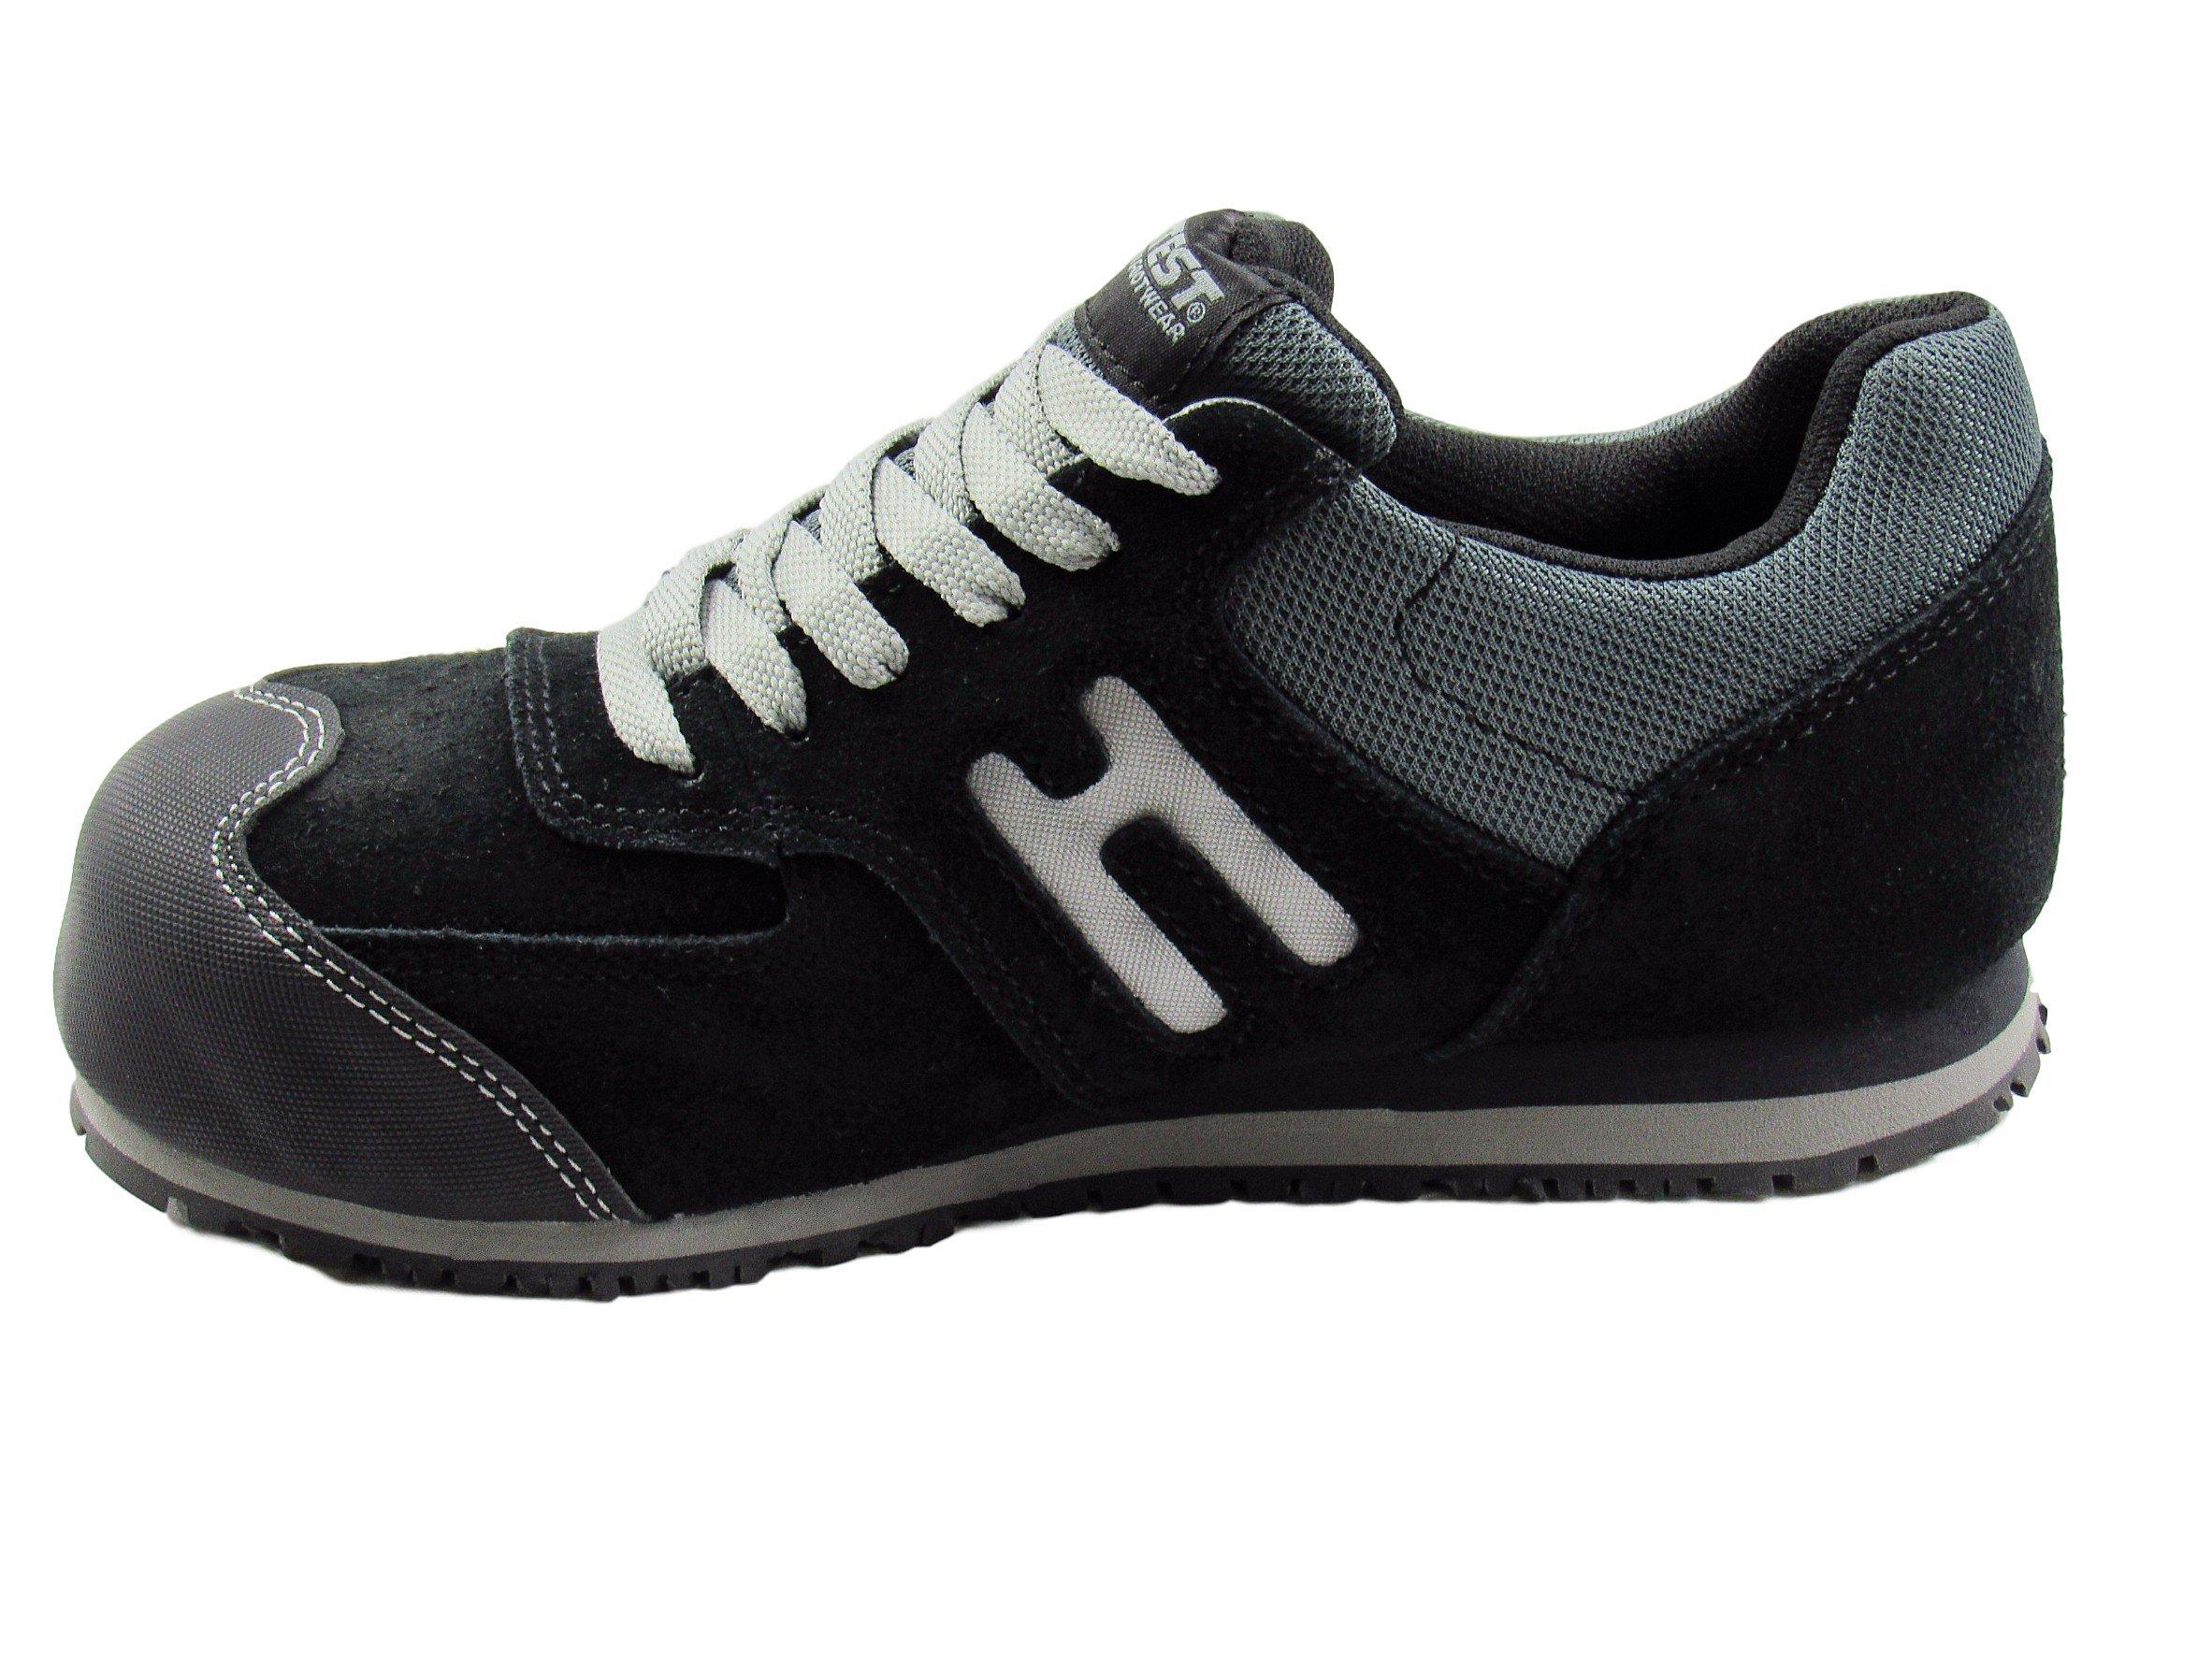 Hytest K17102Womens Athletic Oxford Steel Toe, Electrical Hazard, Slip Resistant Safety Work Shoe (8W US, Black) by Hytest